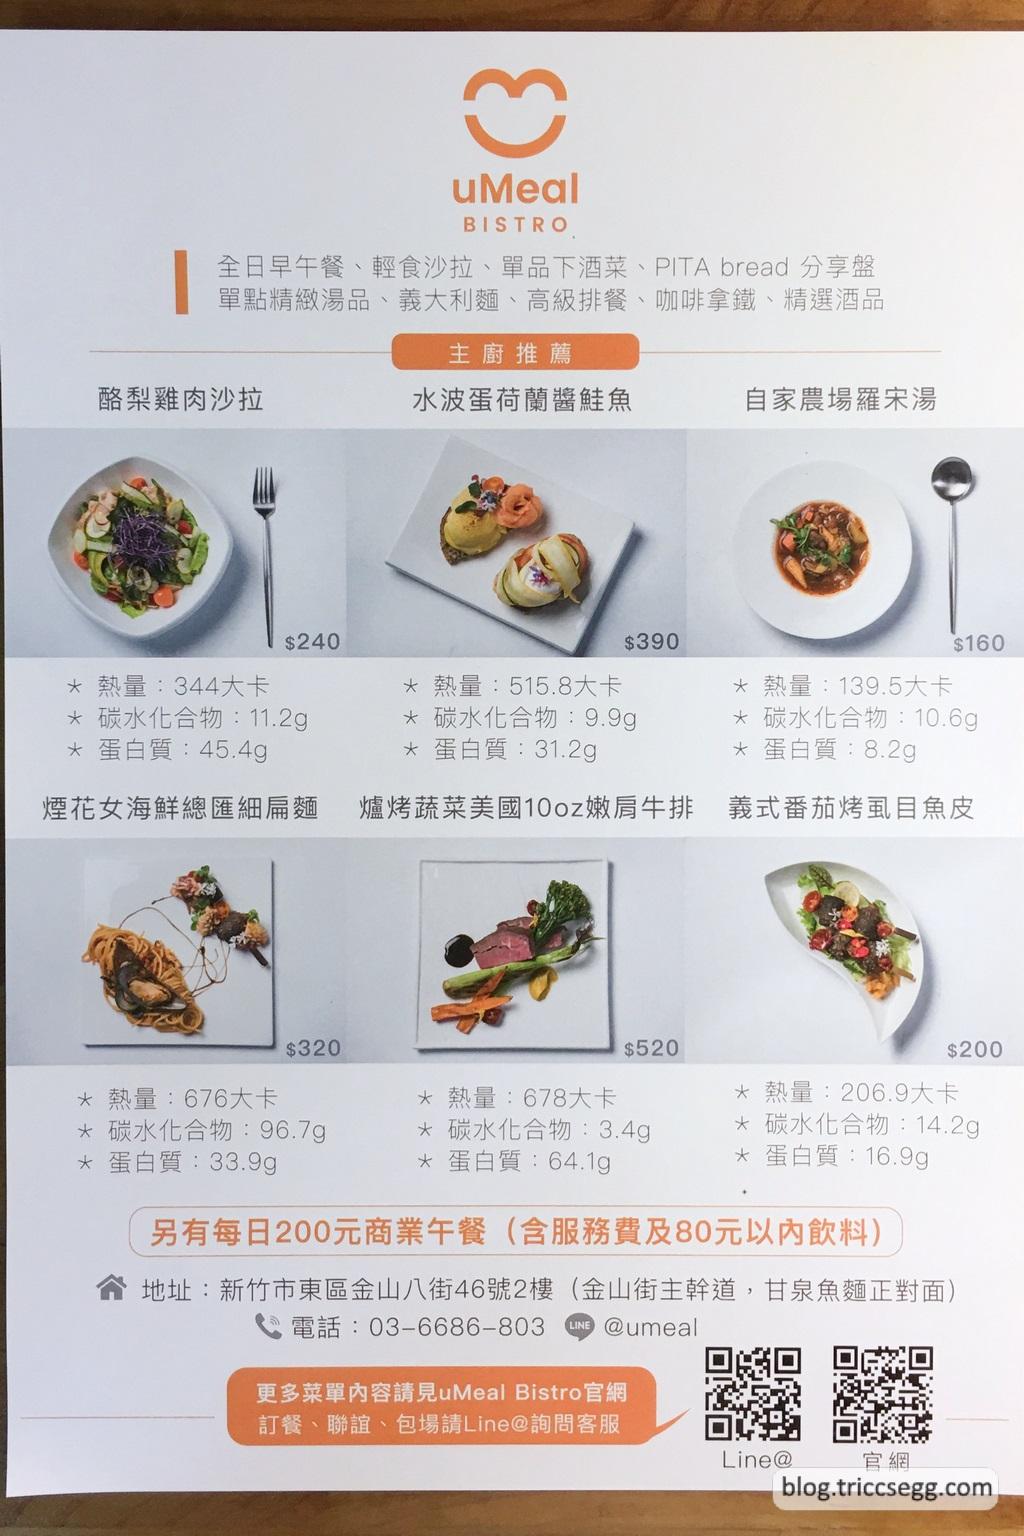 uMeal Birsto菜單(2).jpg